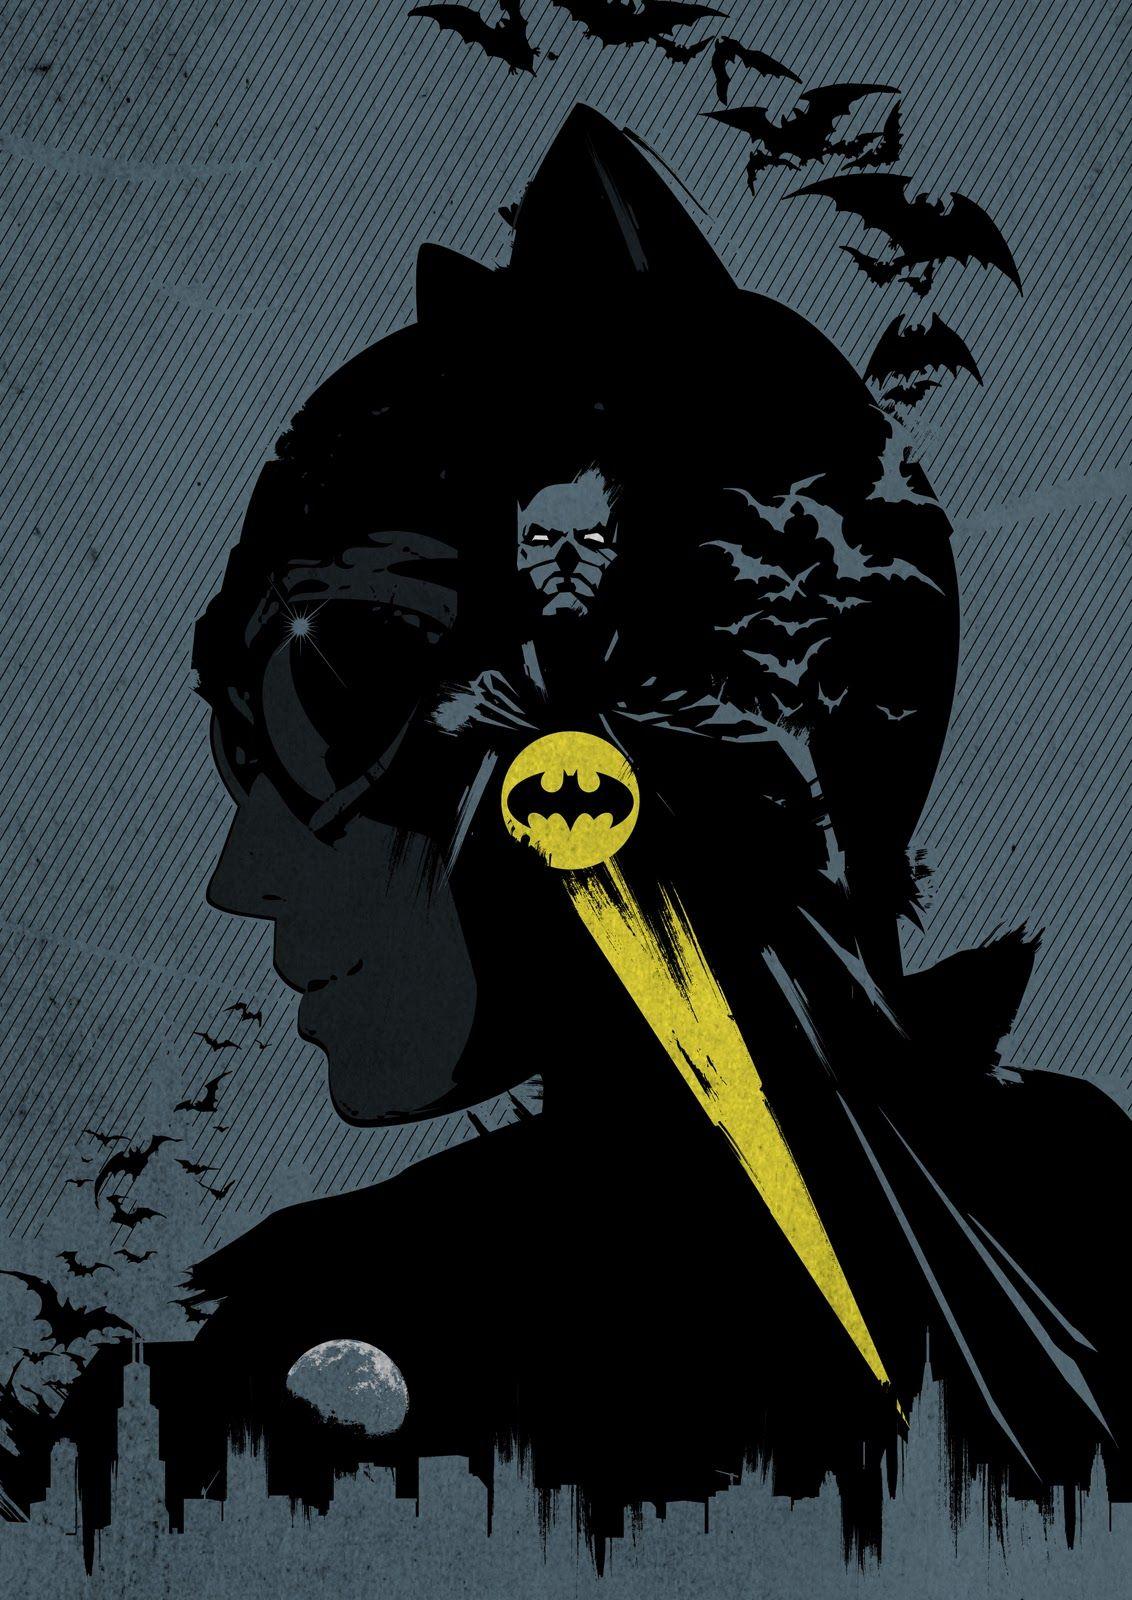 Catwoman & Batman by Dan Shearn